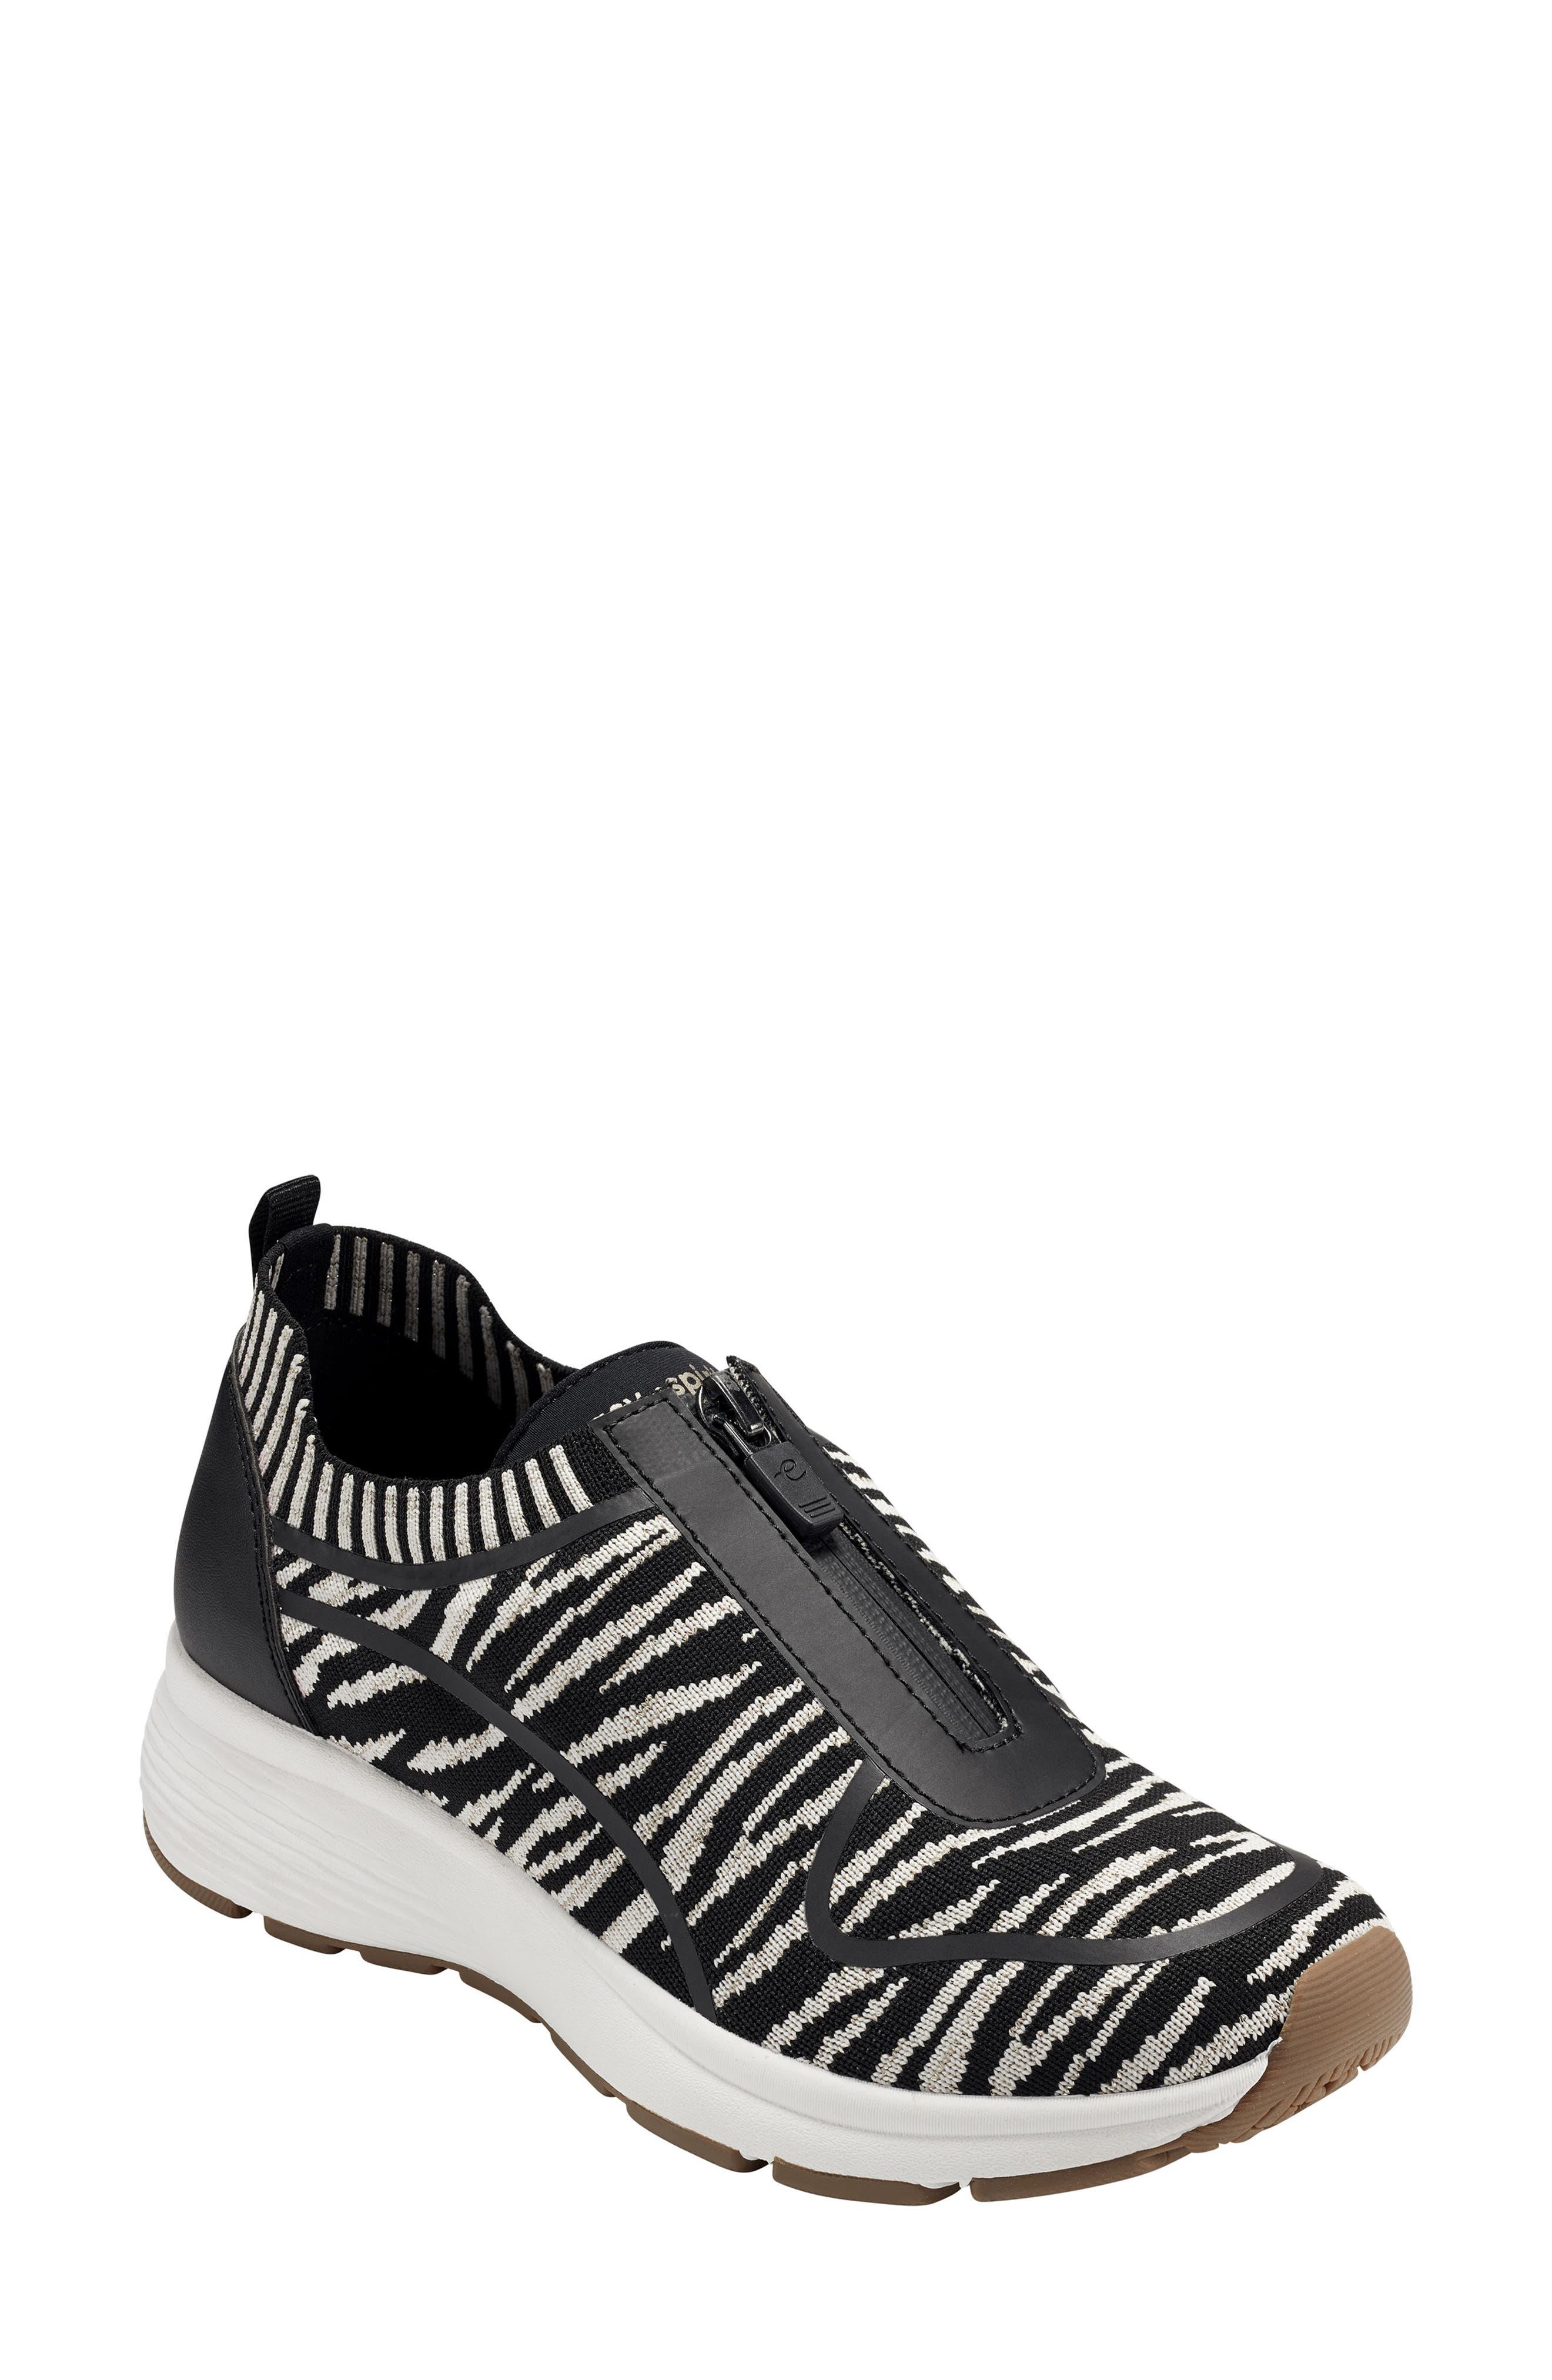 Striver Knit Sneaker